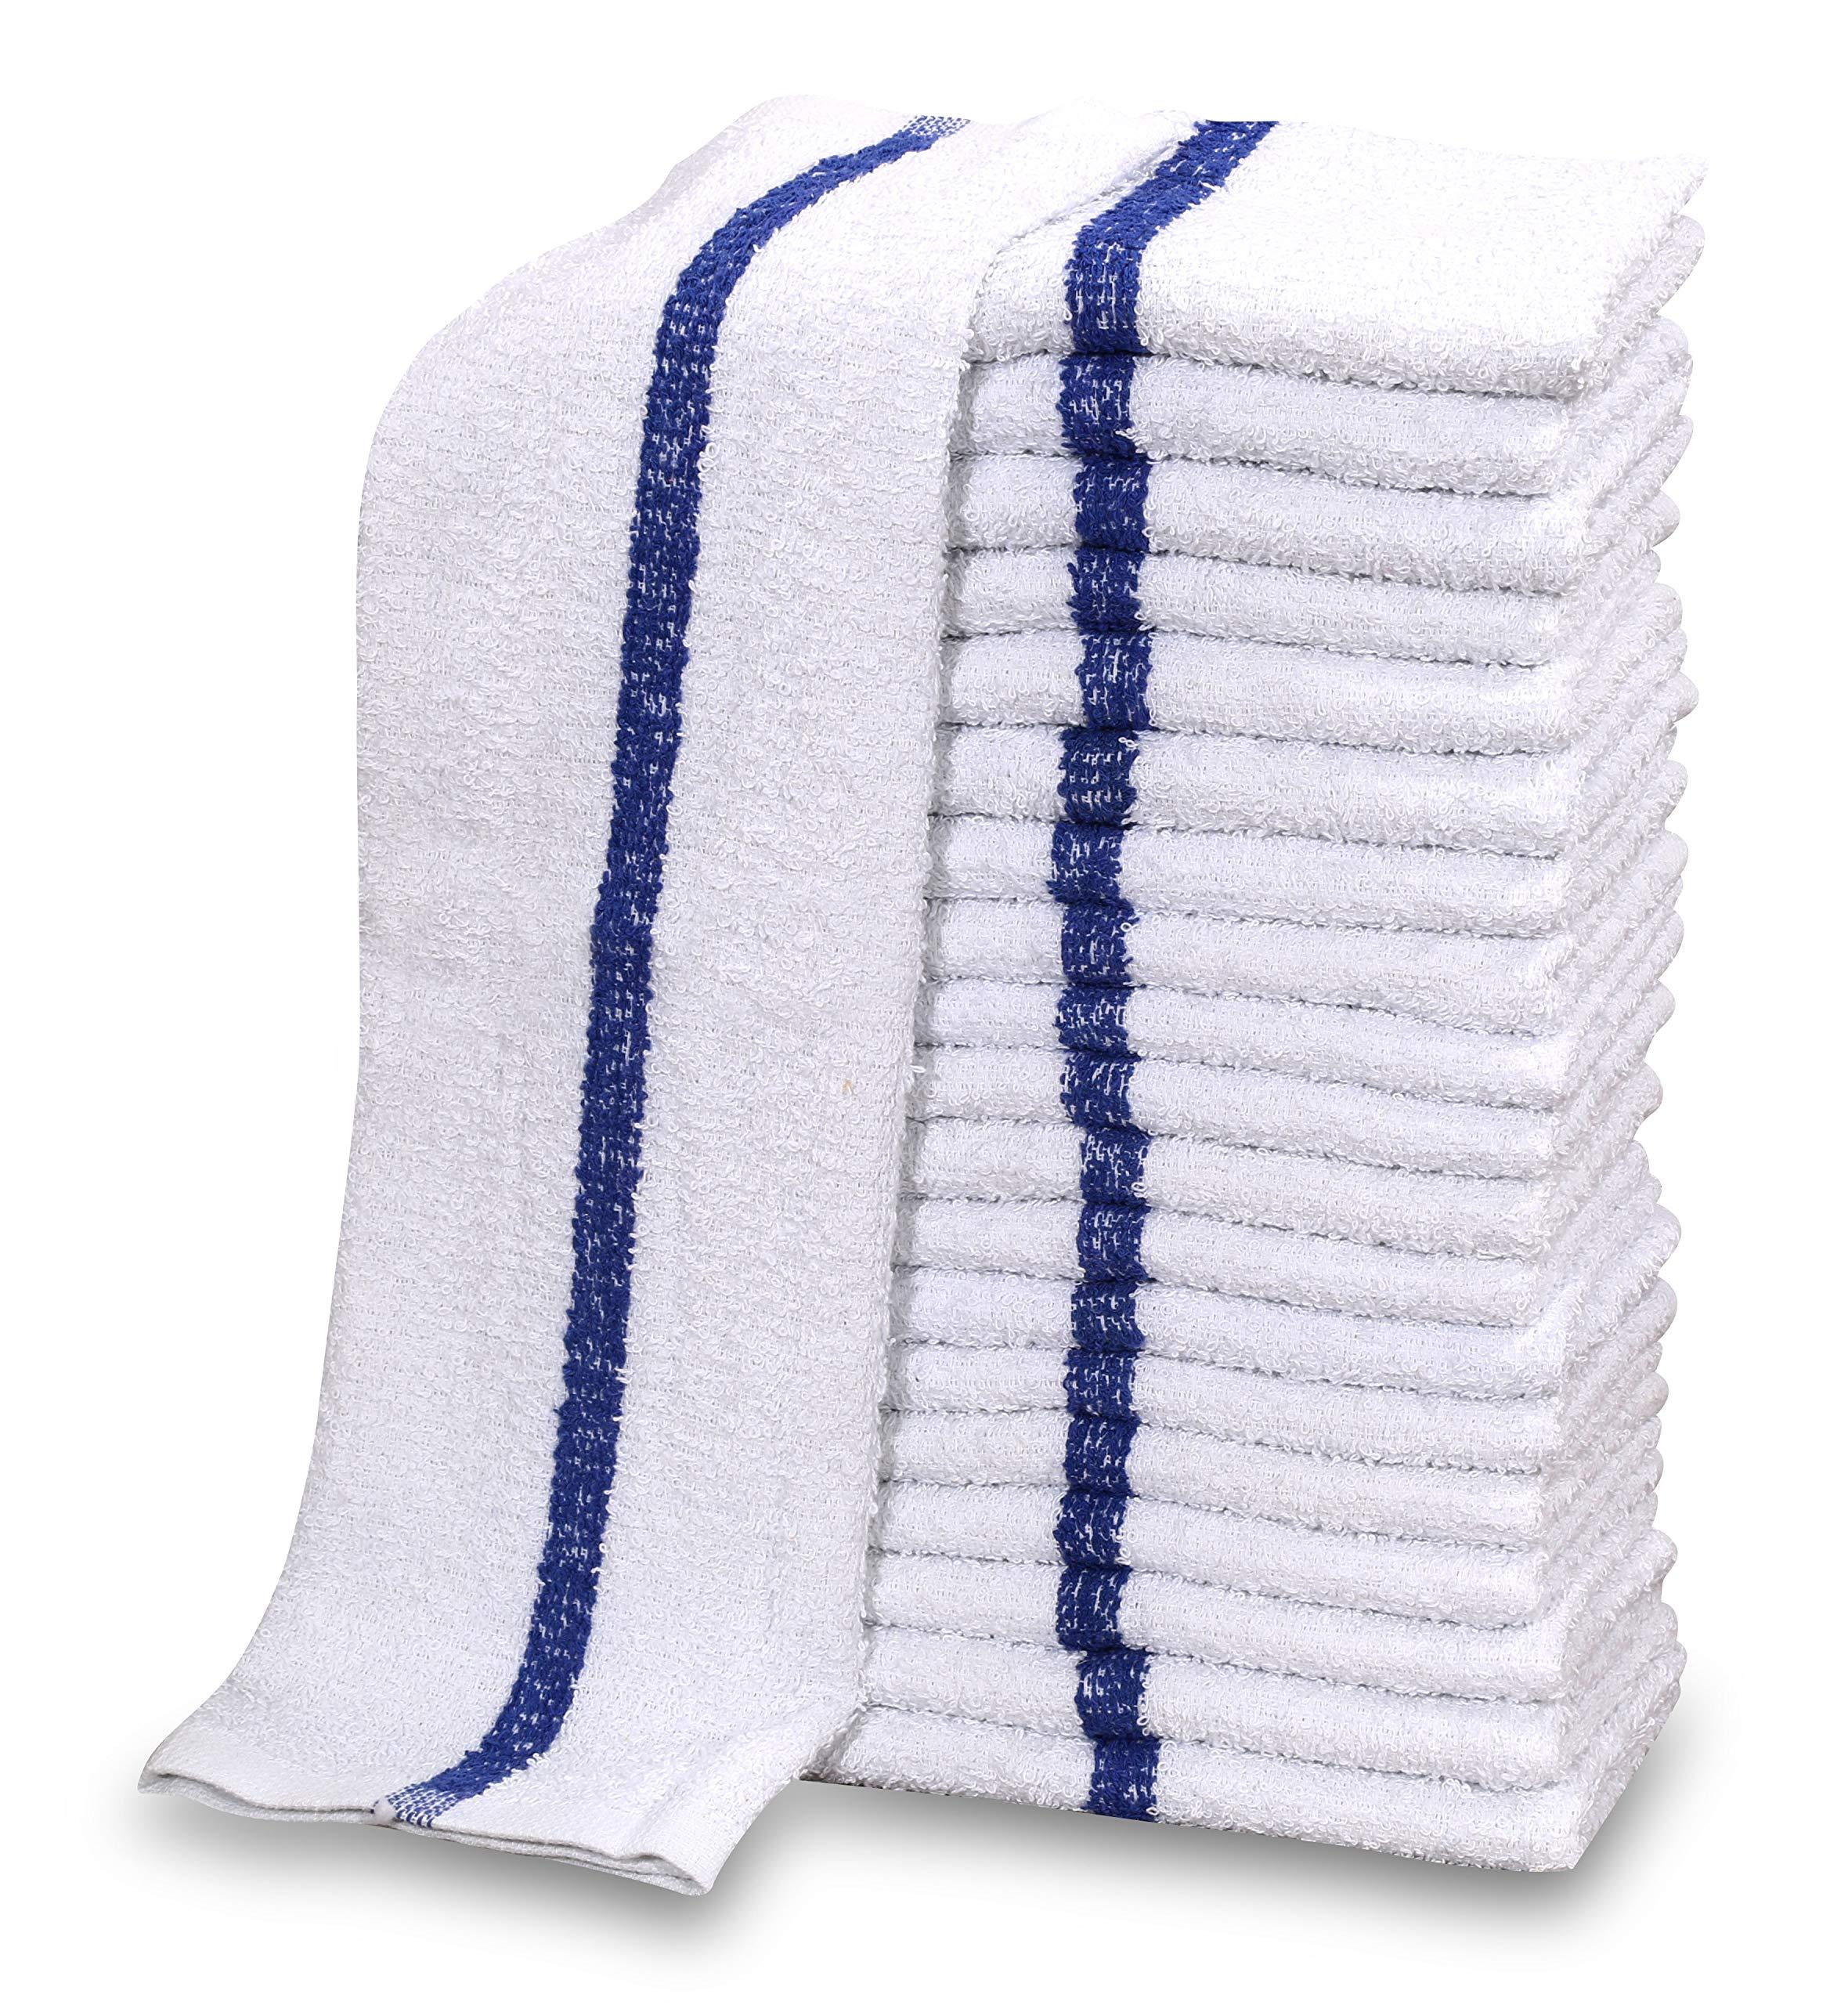 GOLD TEXTILES 60 PC New 100% Cotton White Restaurant Bar Mops Kitchen Towels 28oz (5 Dozen) (60, Blue Stripe)